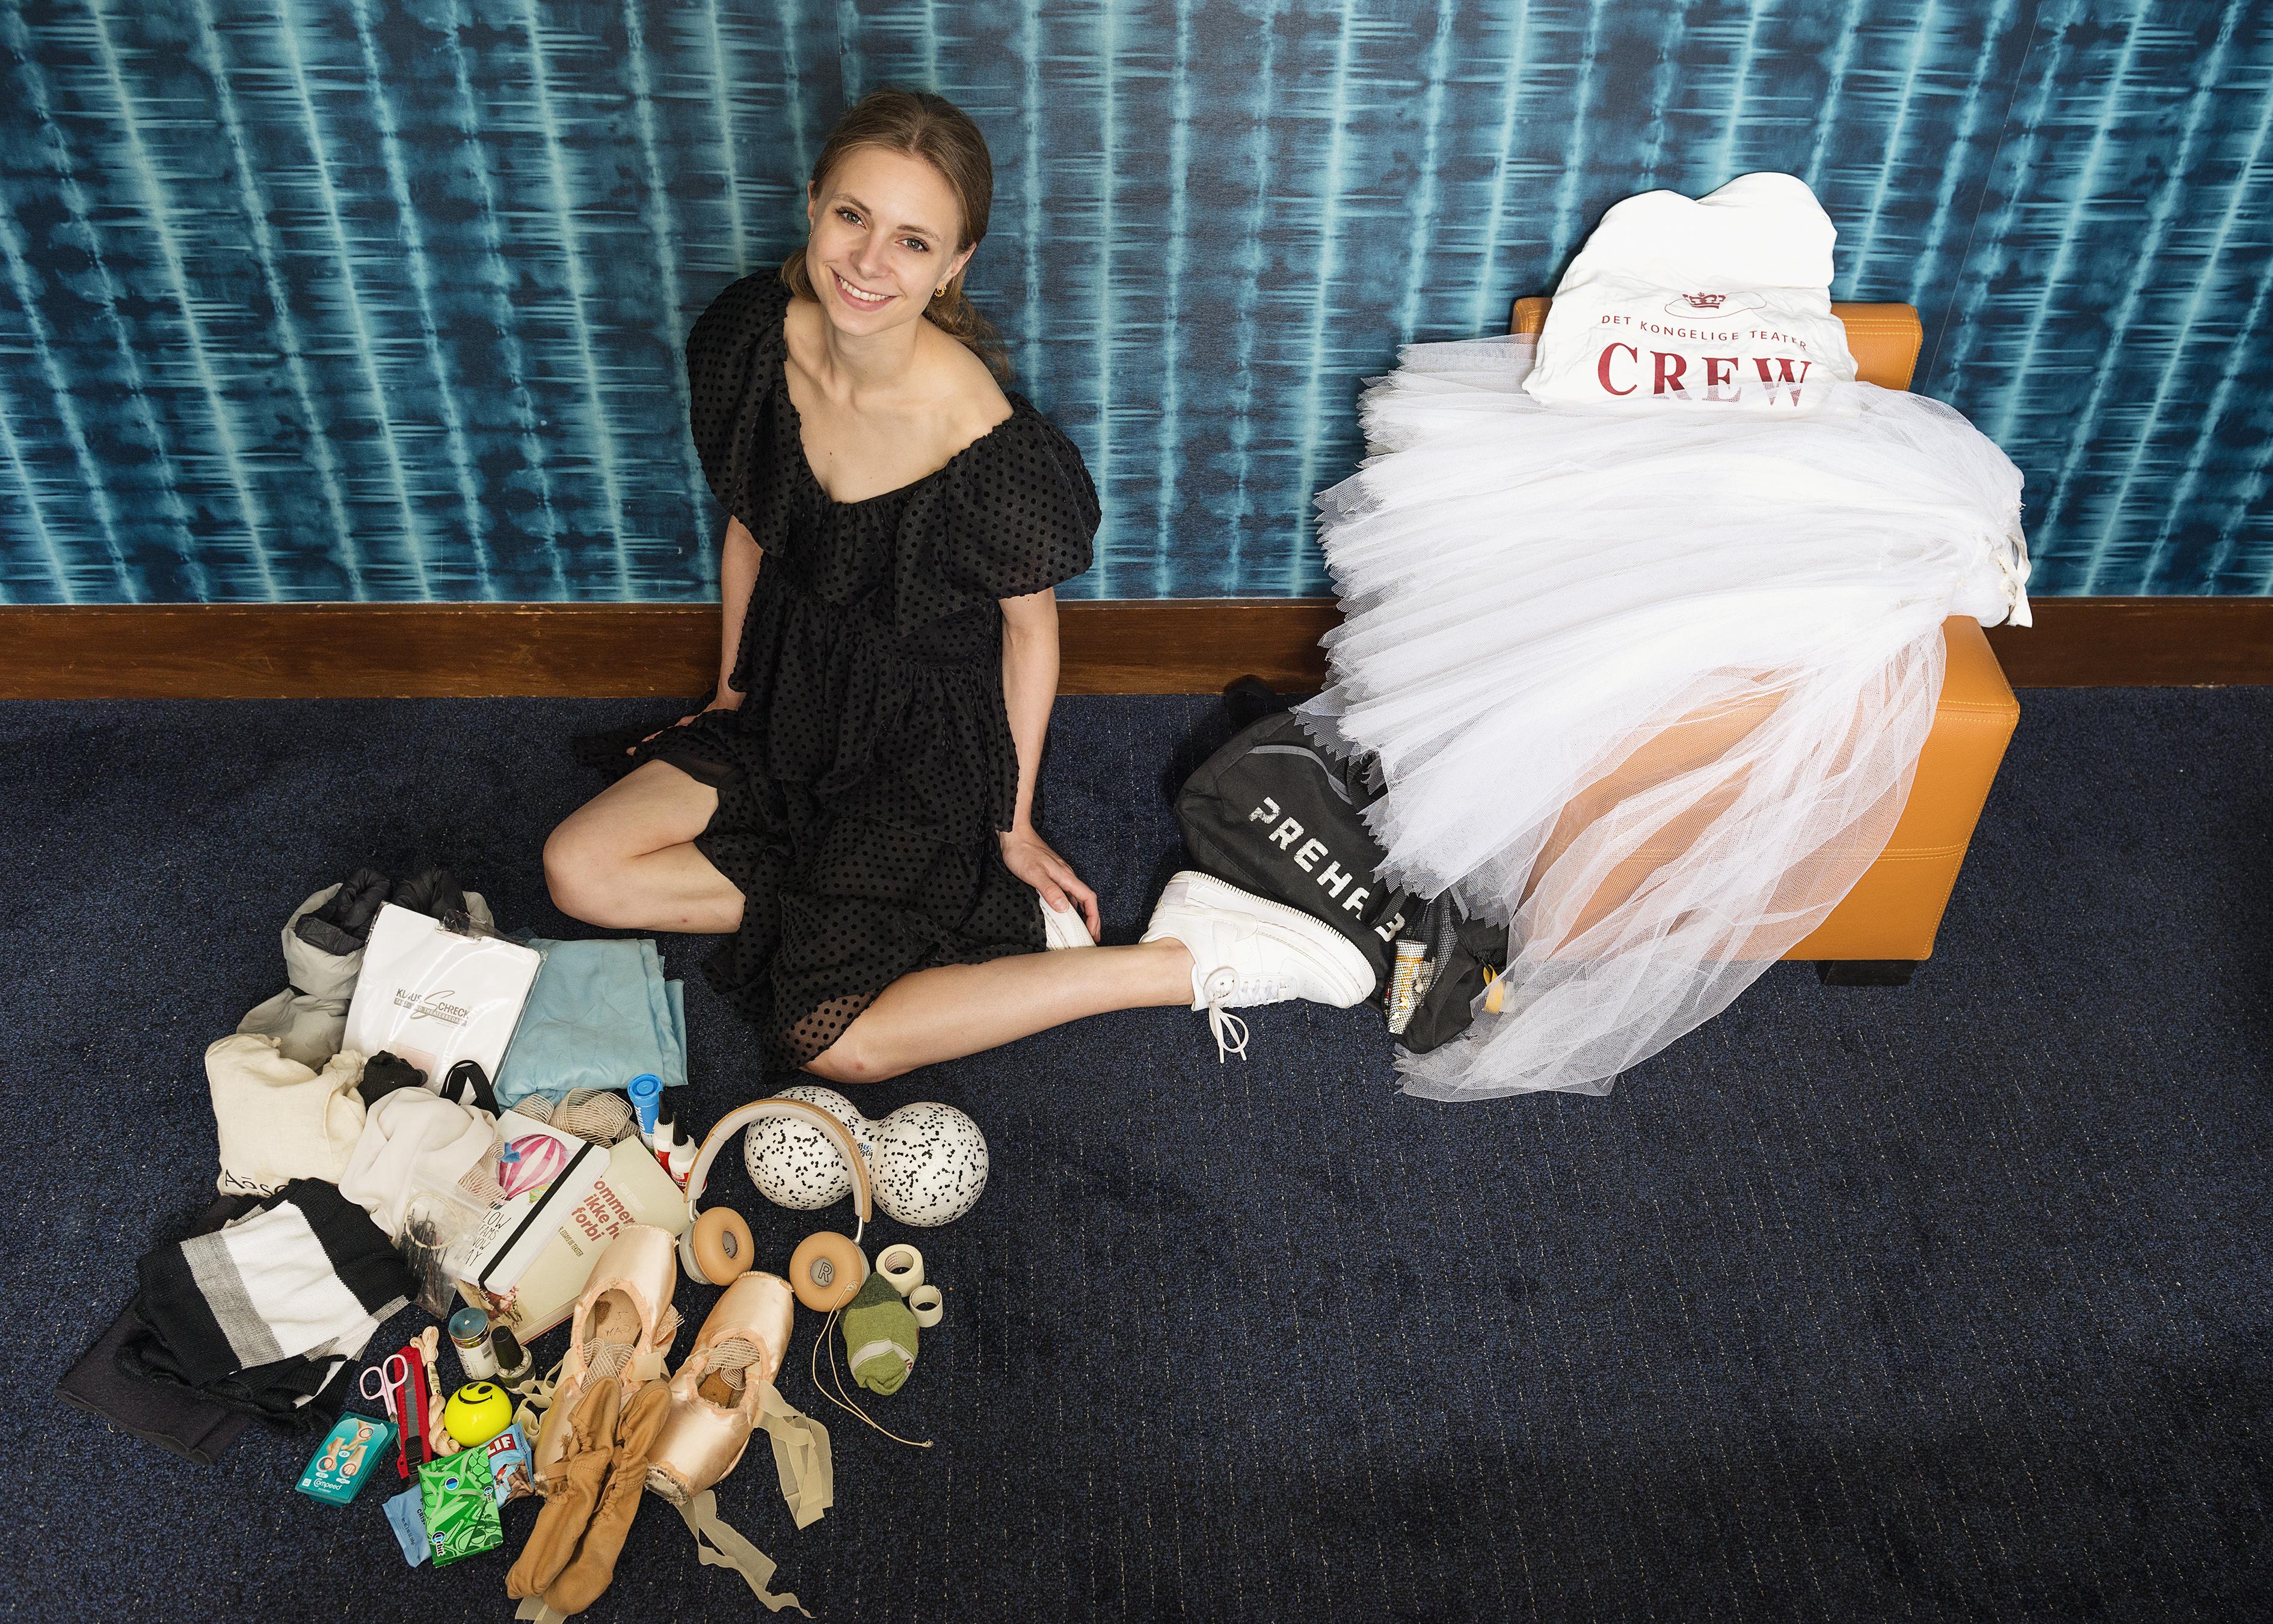 Royal Danish Ballet Principal Ida Praetorius' Dance Bag is Filled With Glamorous Hand-Me-Downs